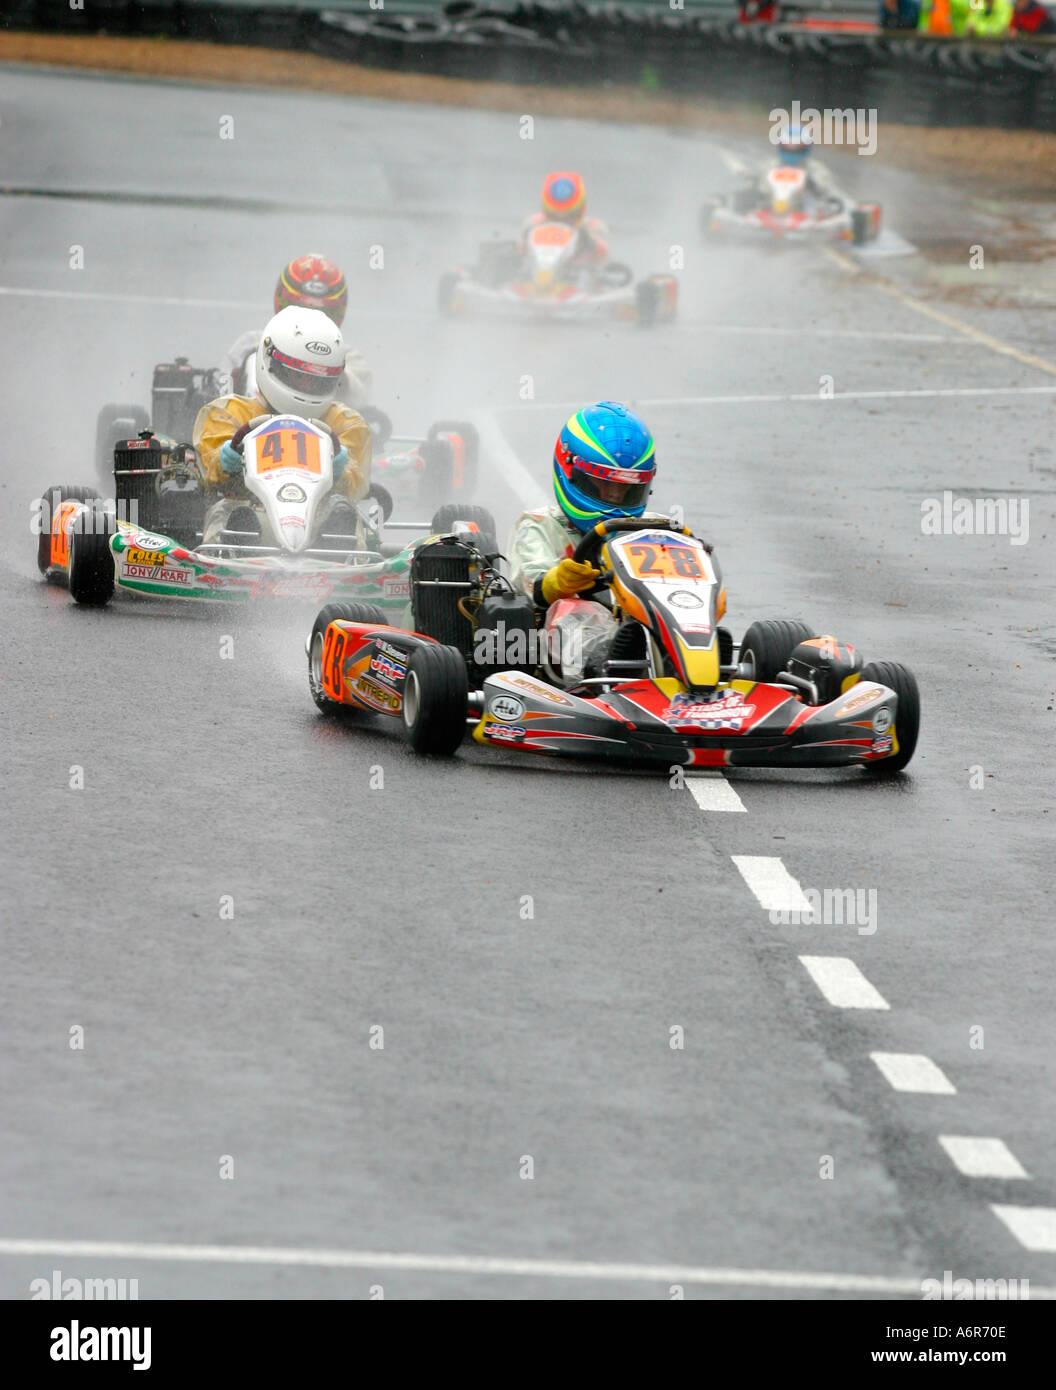 Mini Max Go Kart racing on wet race track Stock Photo: 2160397 - Alamy